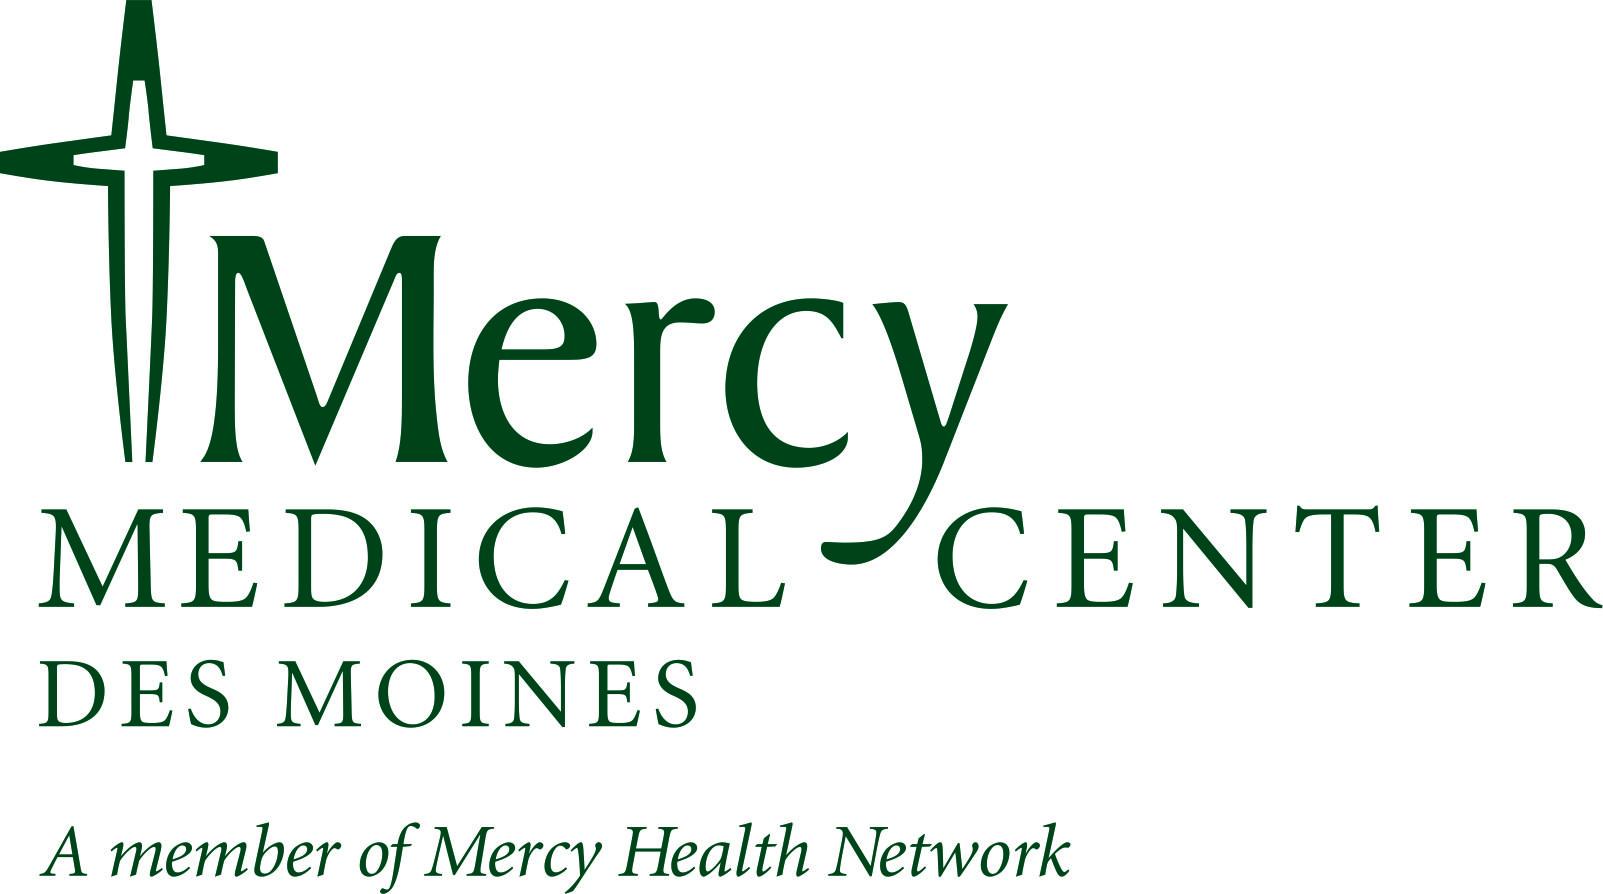 Mercy-DM-1L-3305.jpg